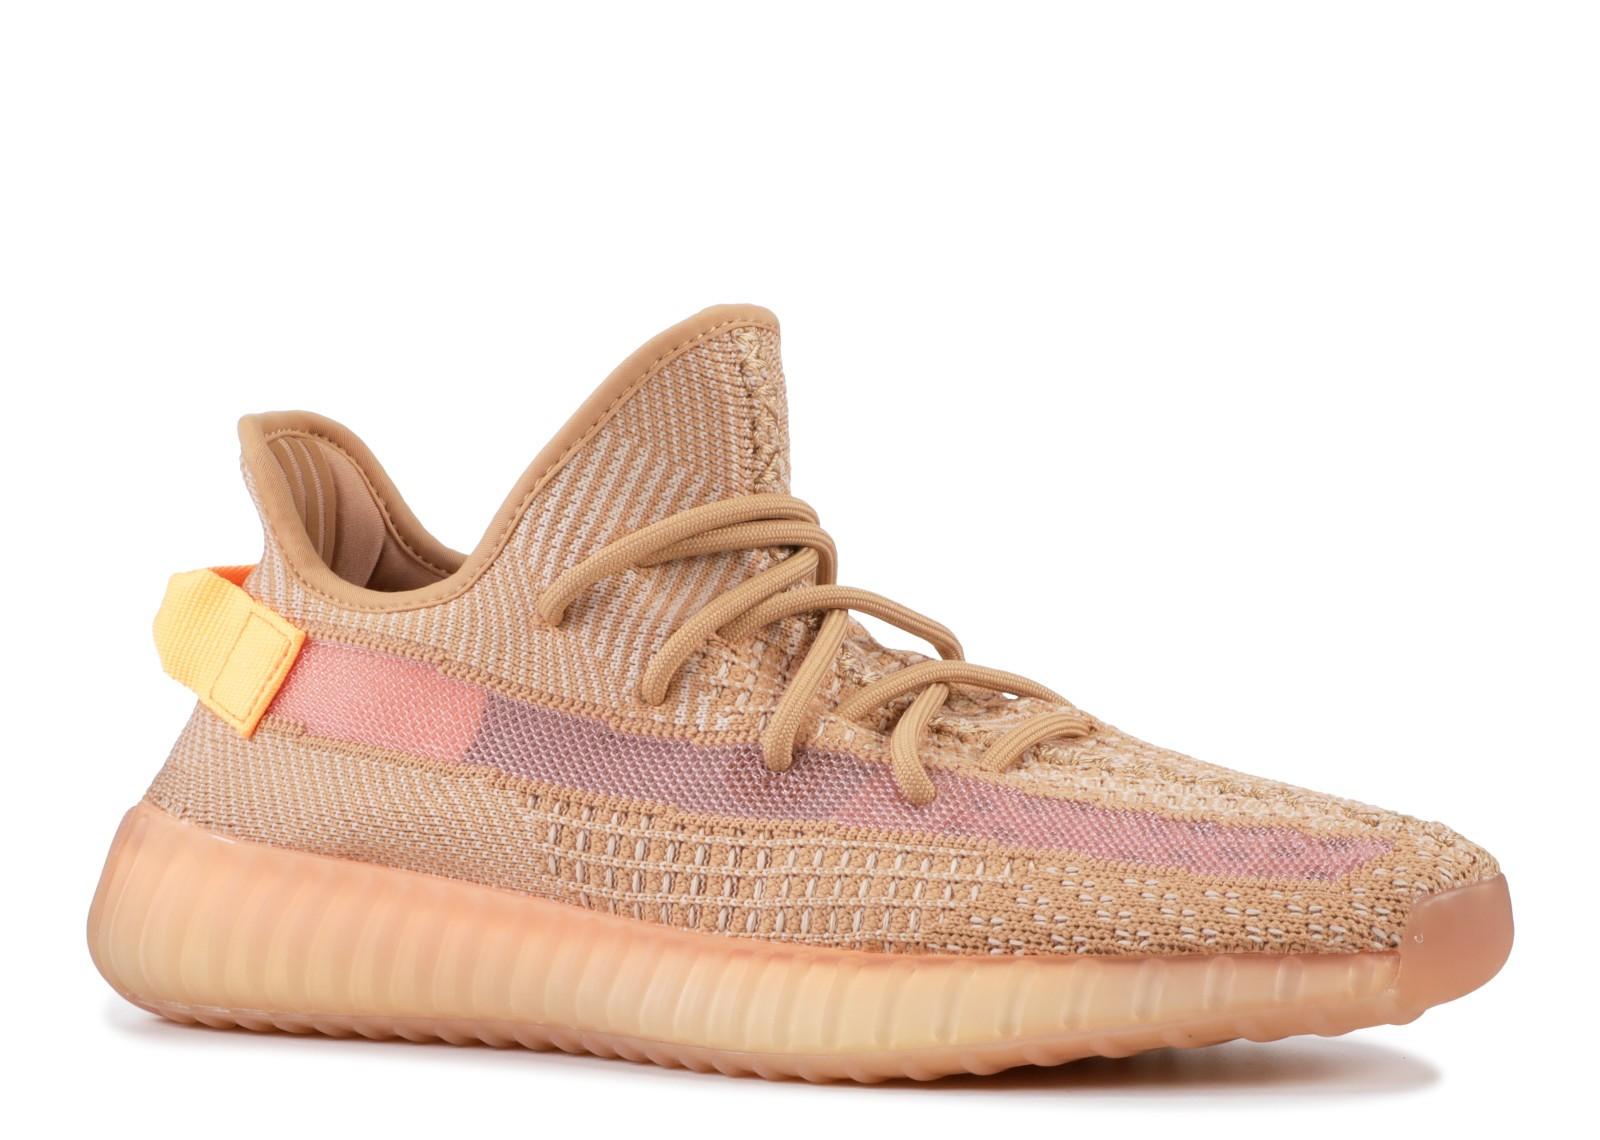 sports shoes 28553 0ef43 UA ADIDAS YEEZY BOOST 350 V2